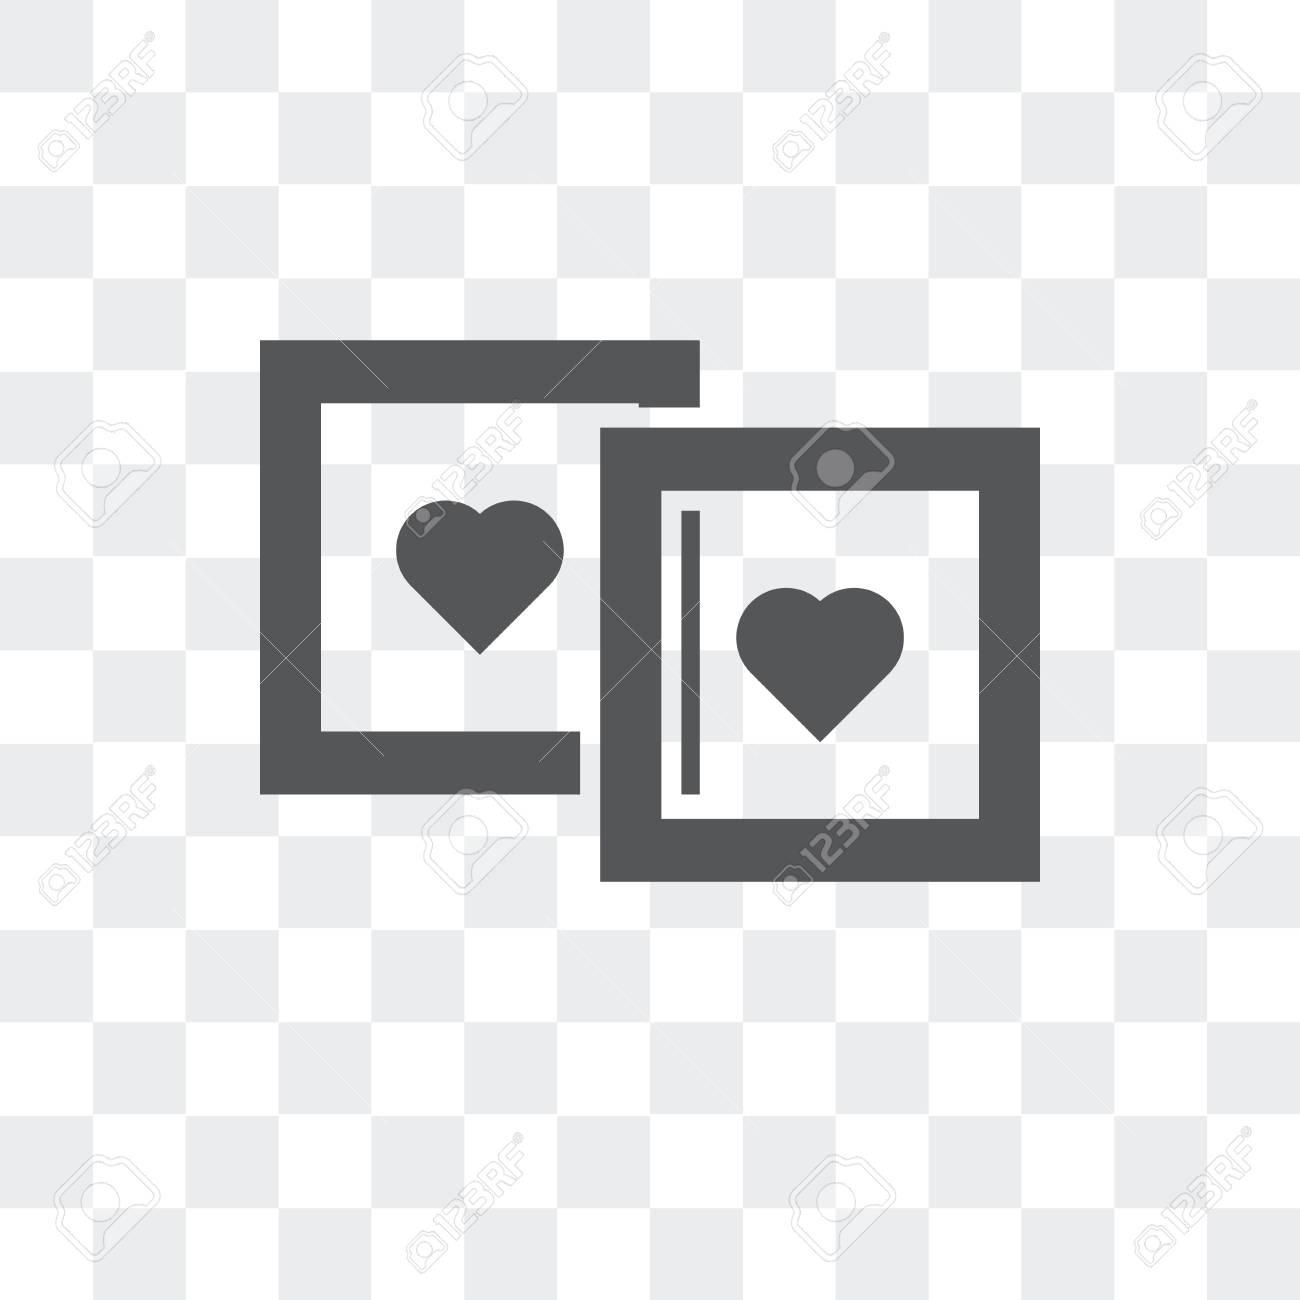 vector icon isolated on transparent background polaroid logo